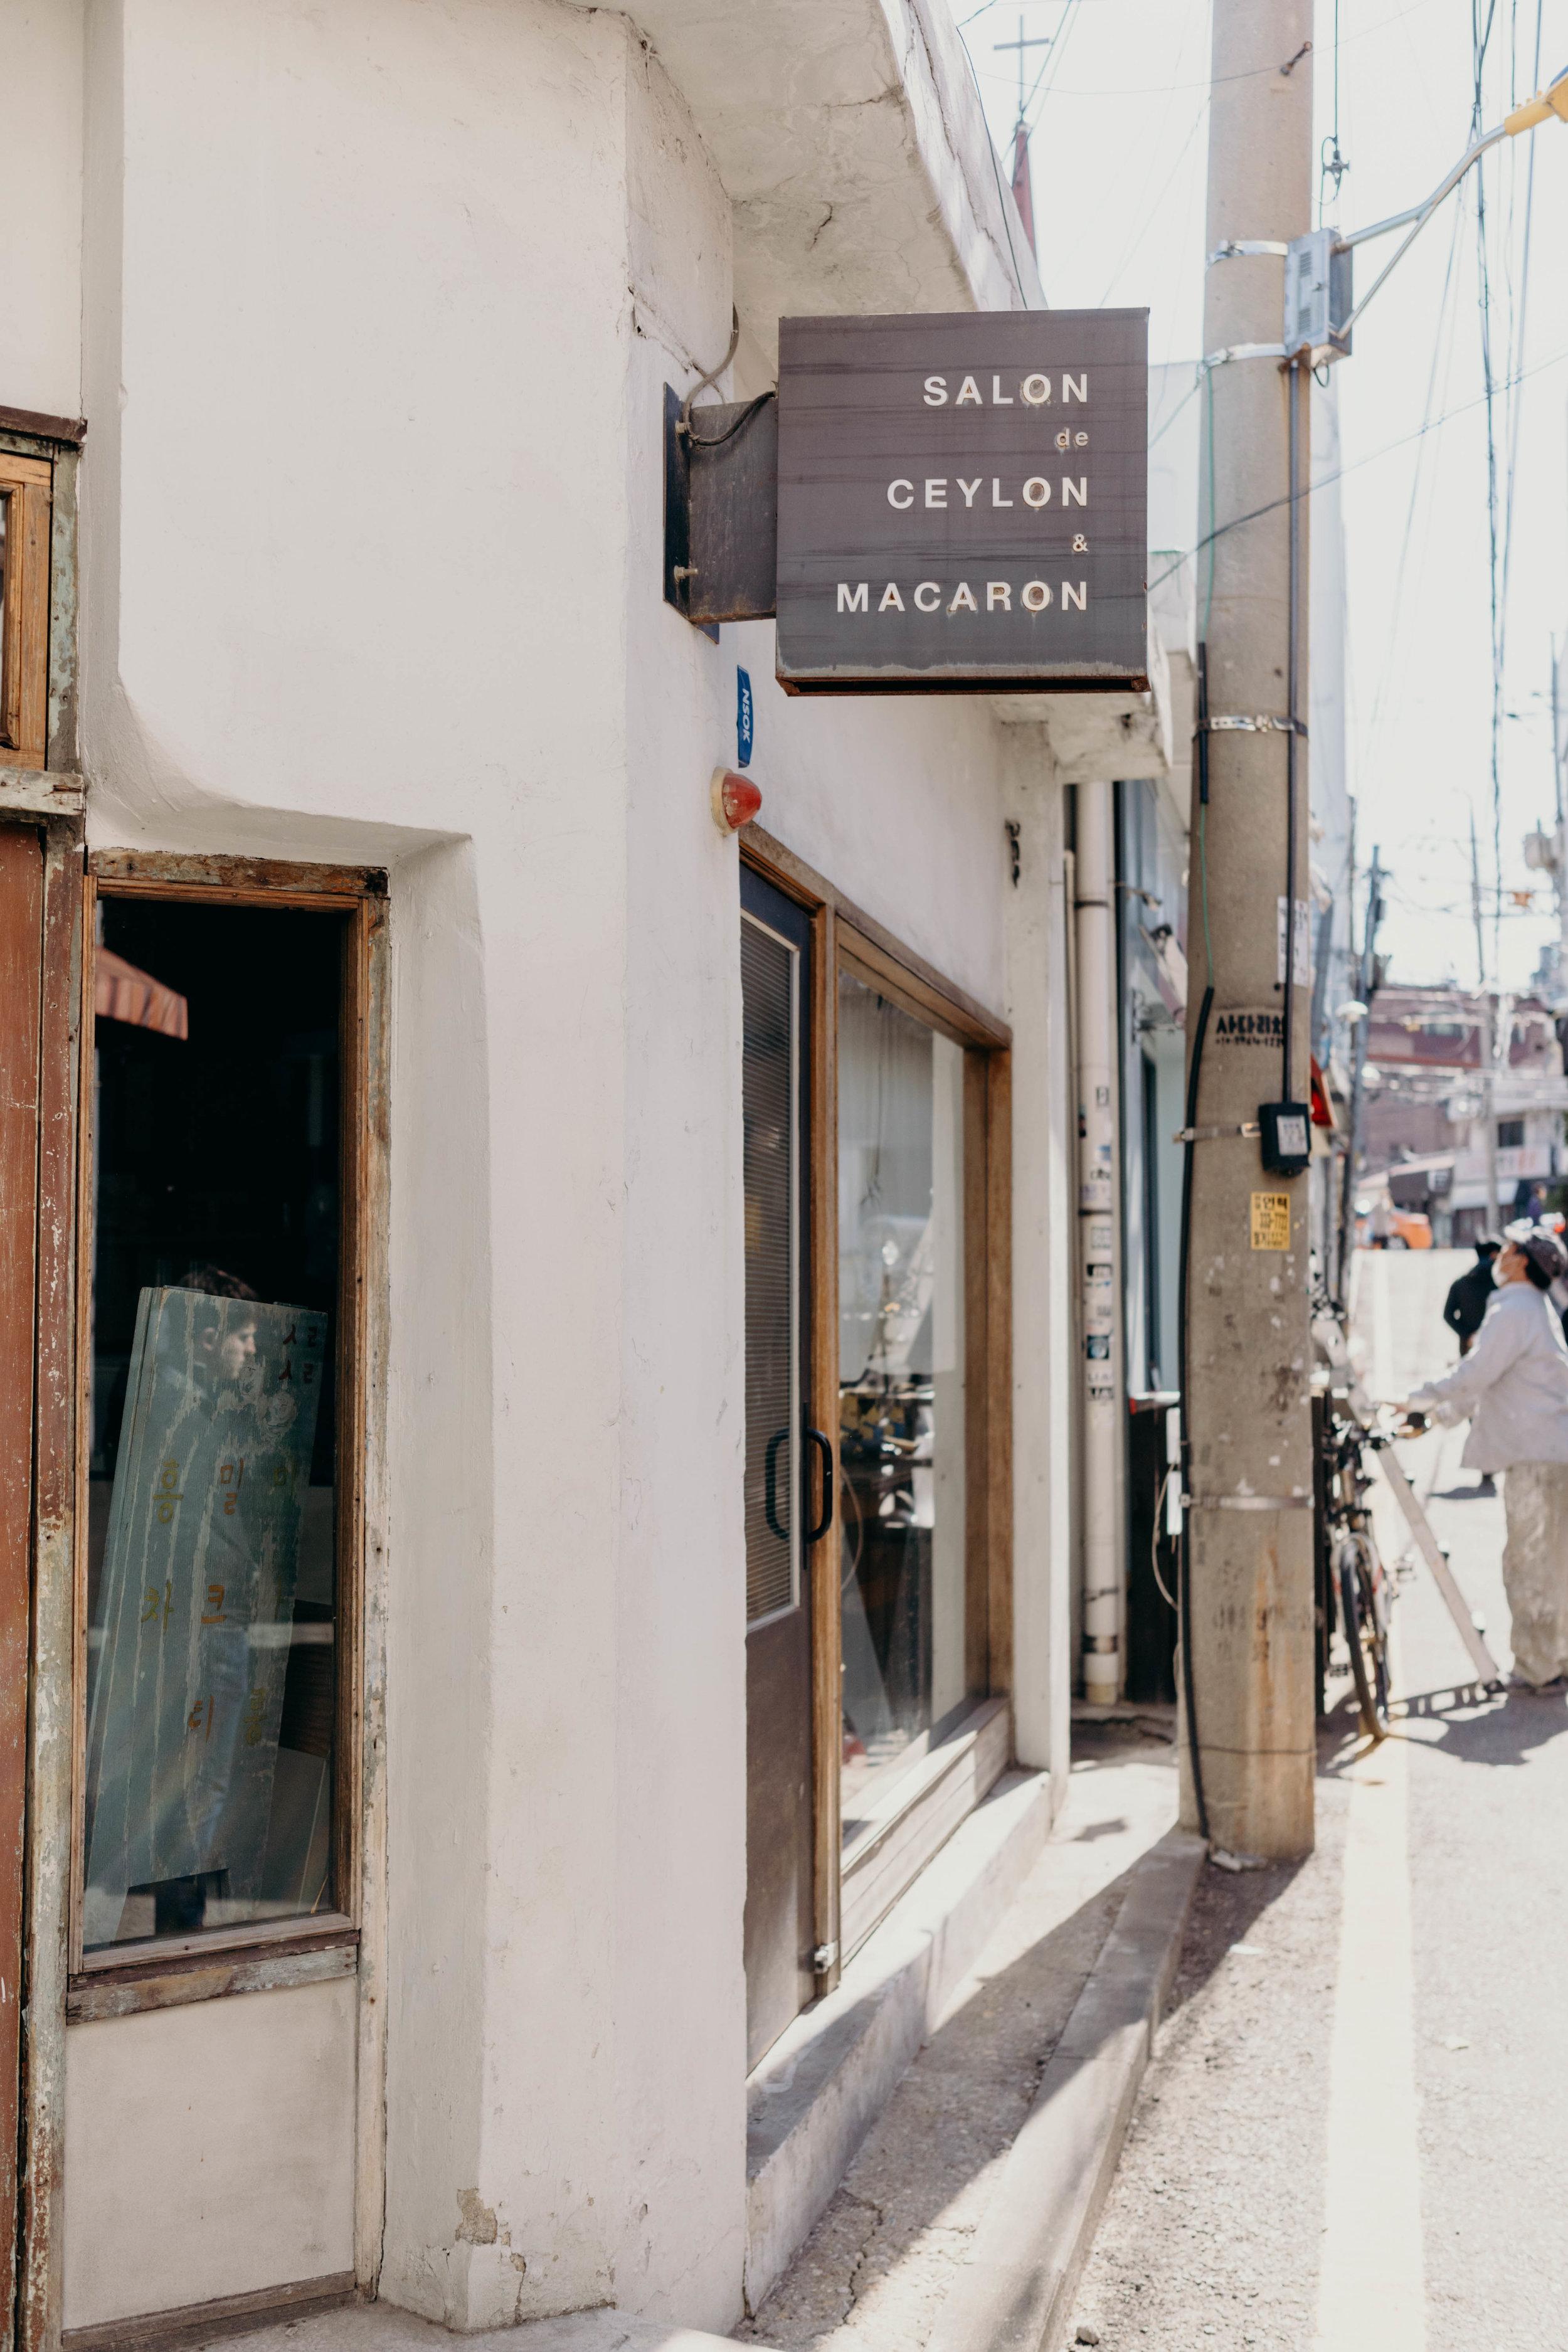 Off the Beaten Path: Yeonnam-dong | On the Street Where We Live ( aretherelilactrees.com )  Seoul, South Korea, Salon de Ceylon & Macaron